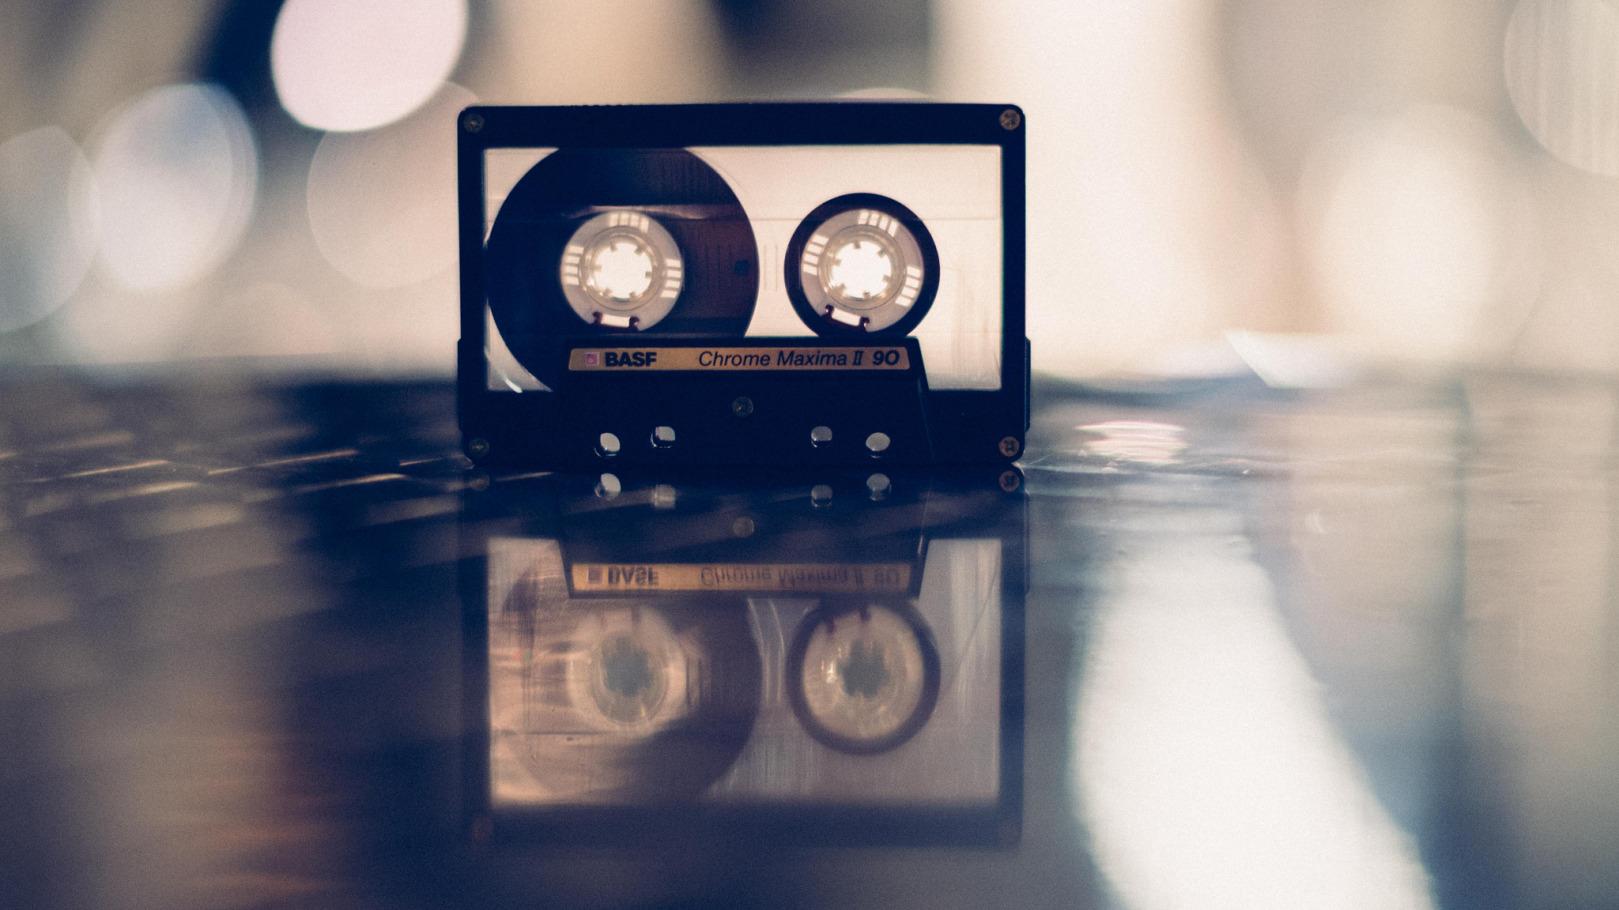 basf-kasseta-muzyka-fon